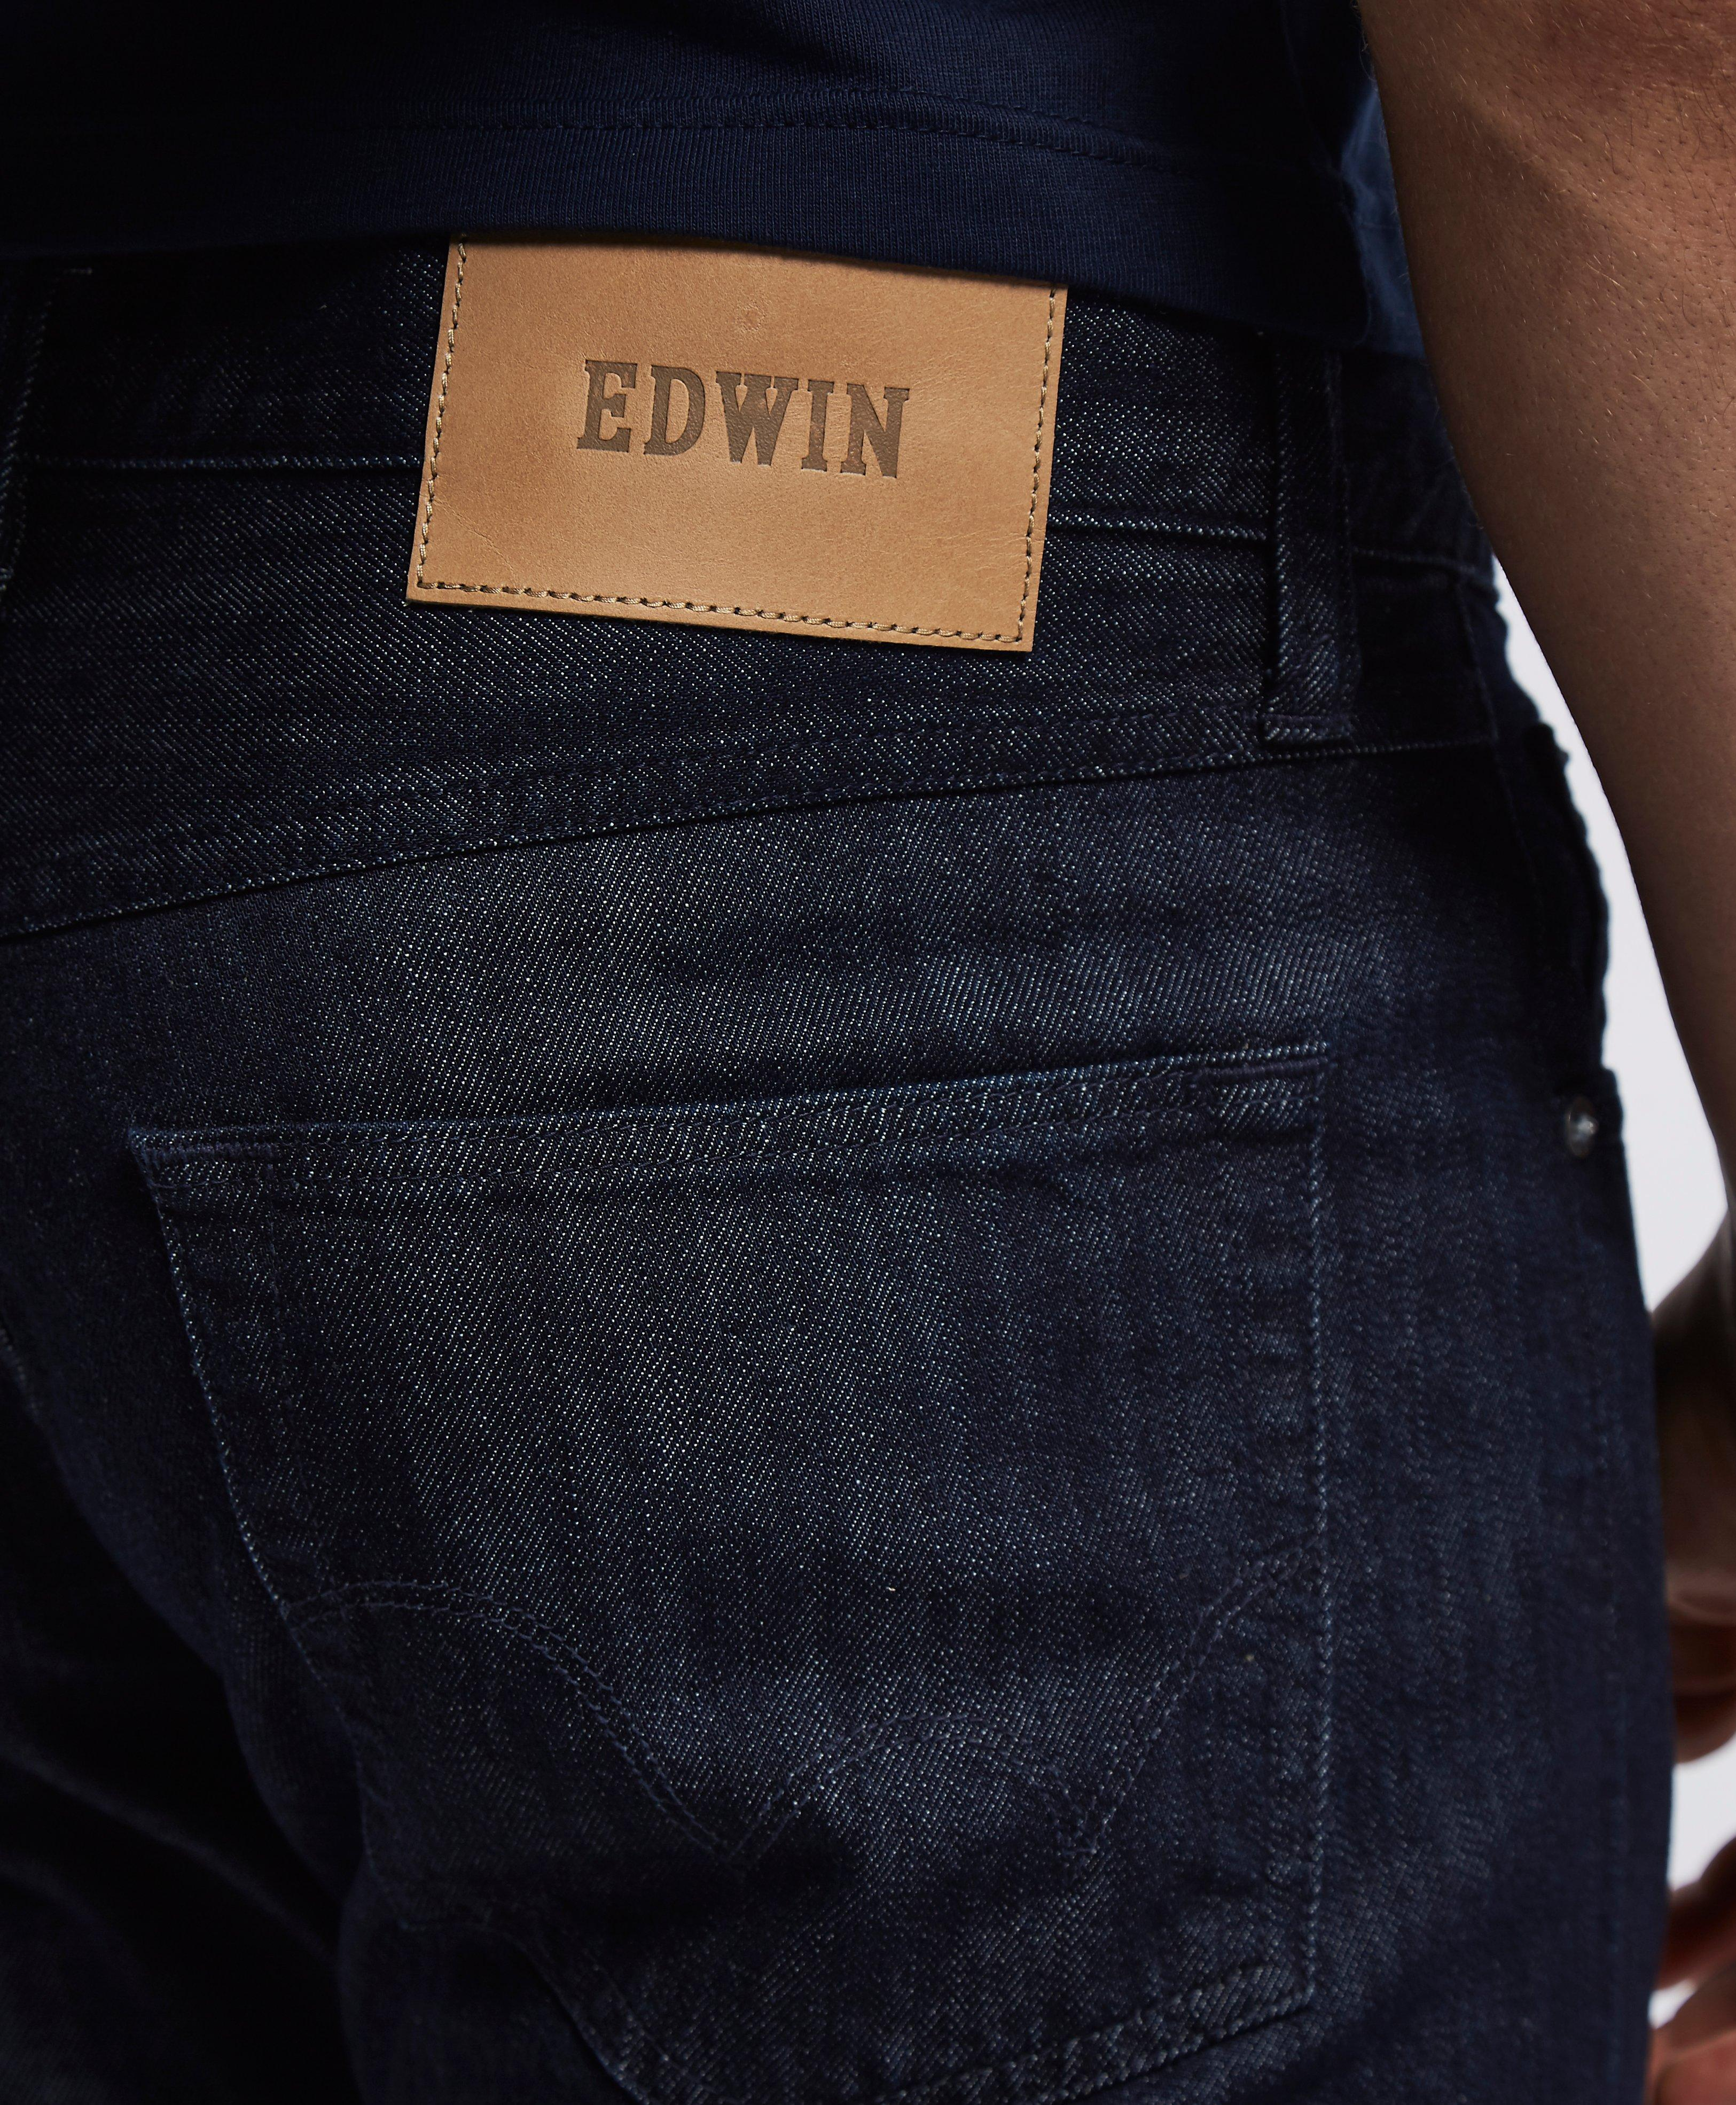 Jeans 55 For Regular Men Kingston Edwin Ed Tapered Lyst In Blue qCX77x